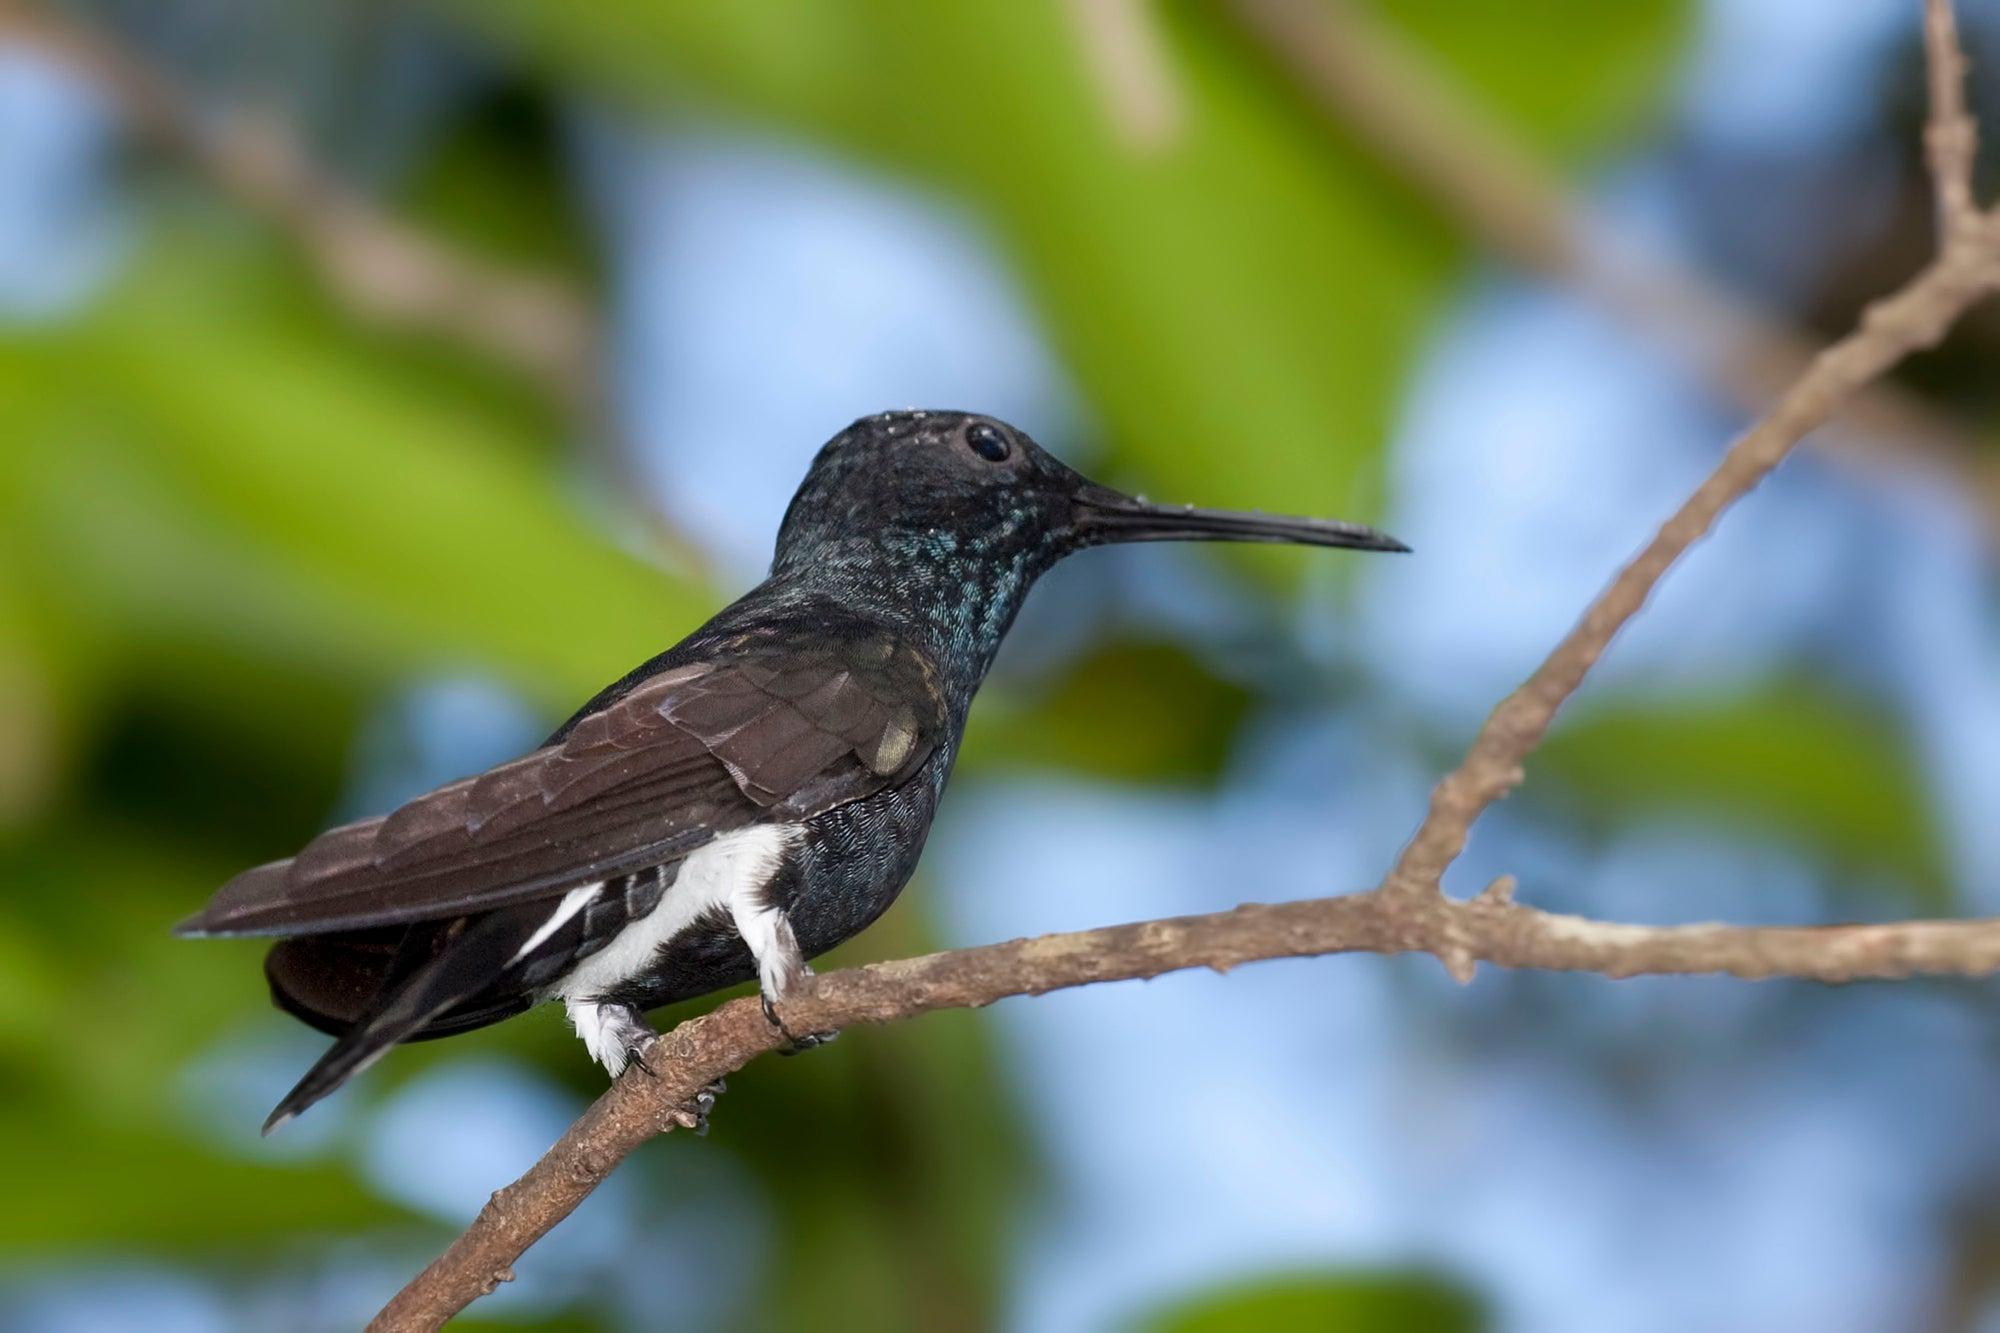 Male black jacobin hummingbird on a branch